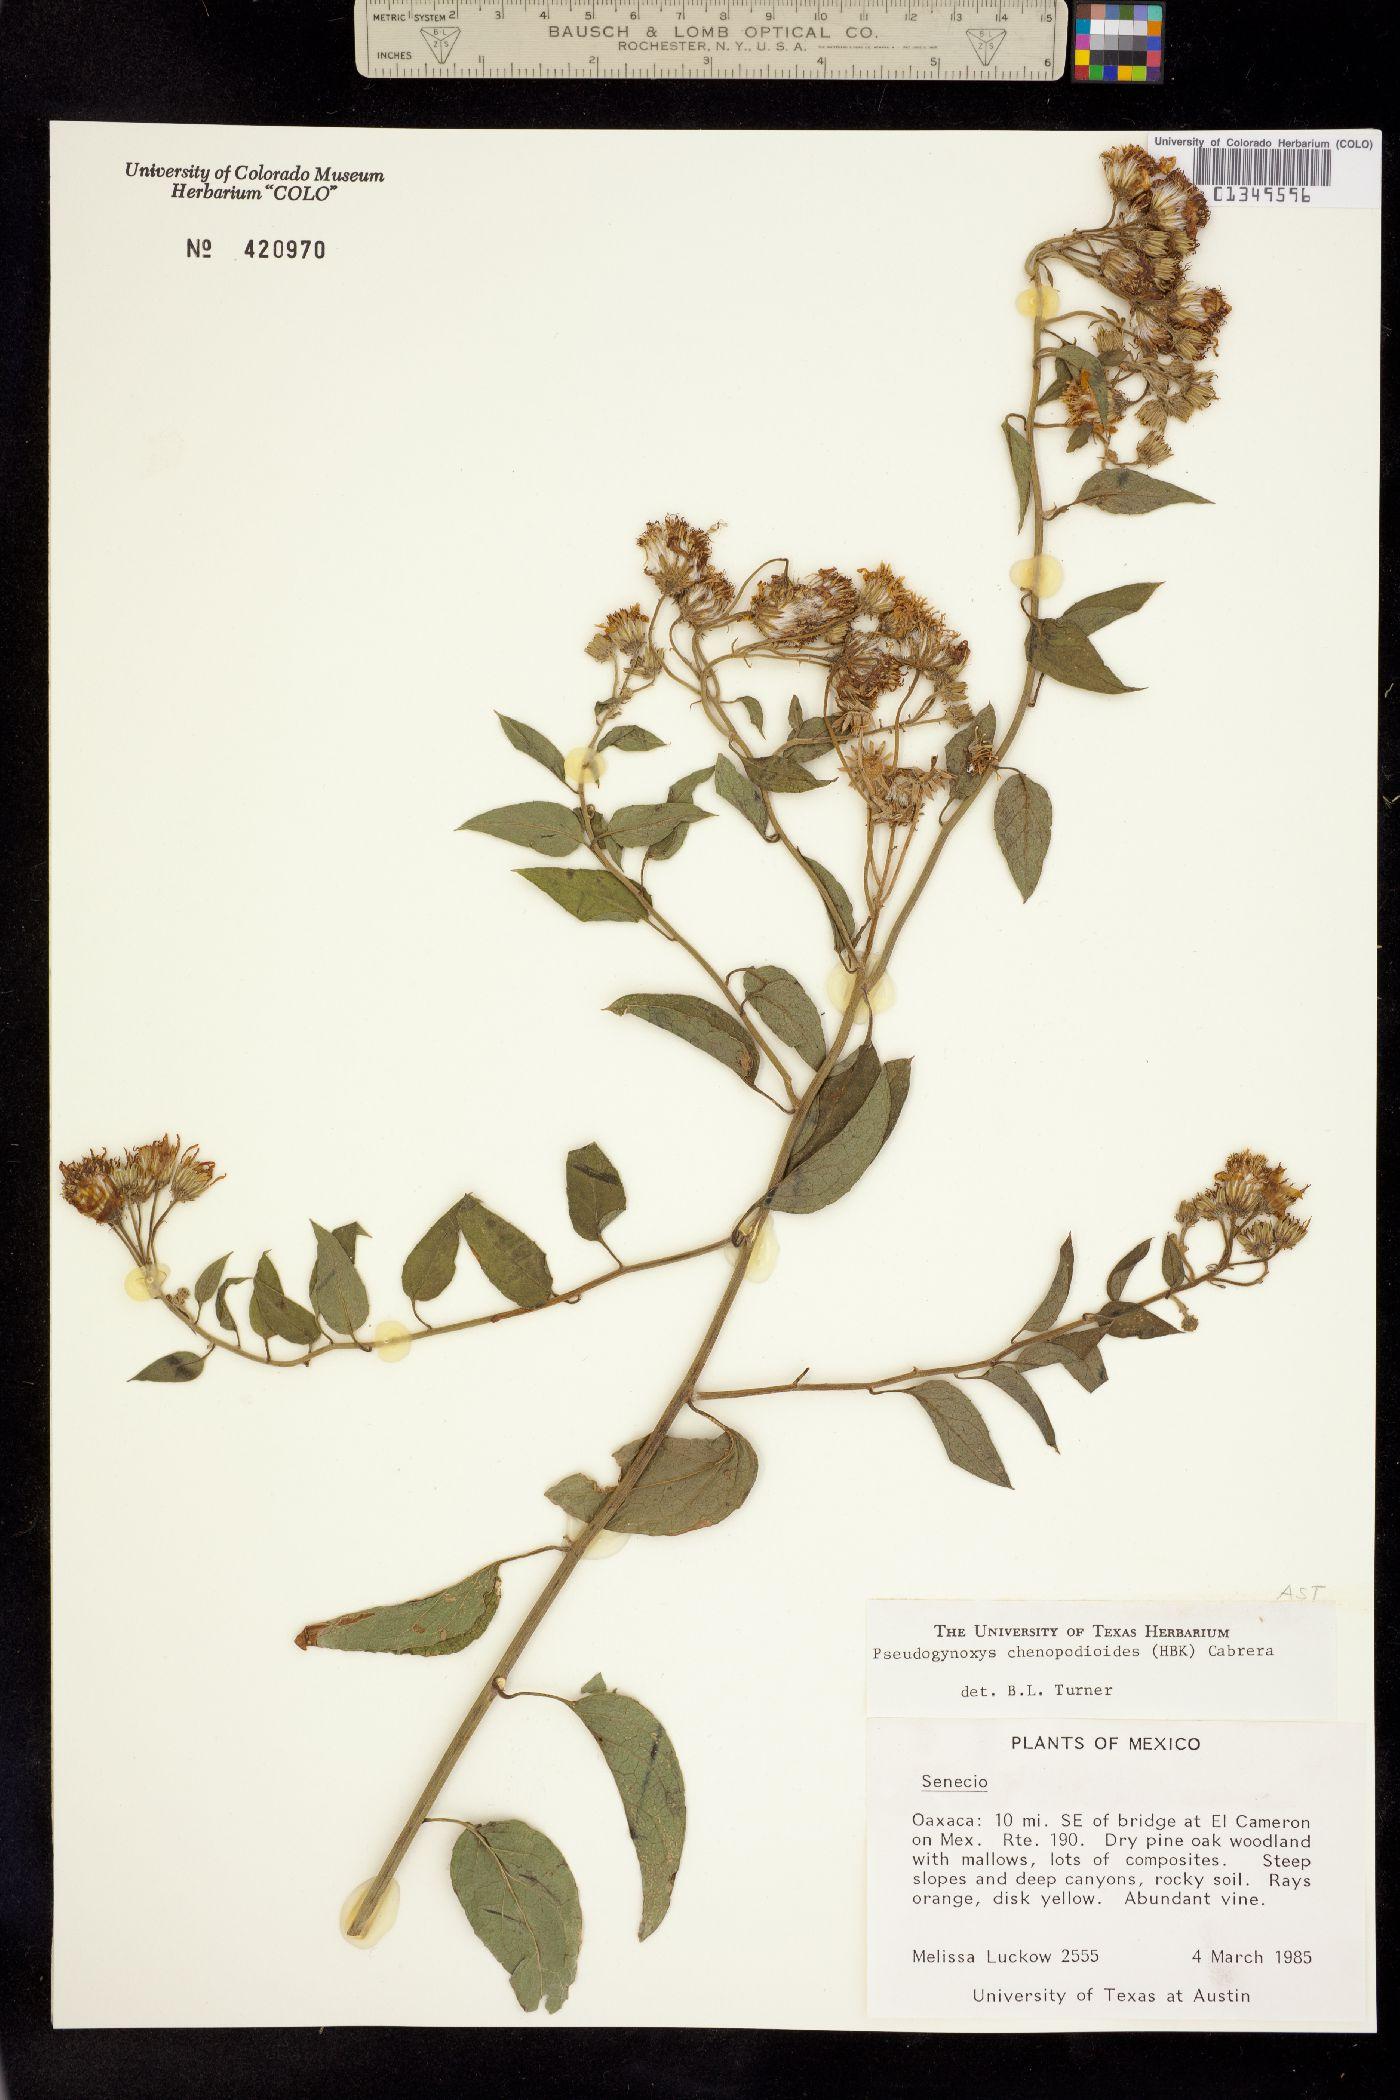 Pseudogynoxys chenopodioides image